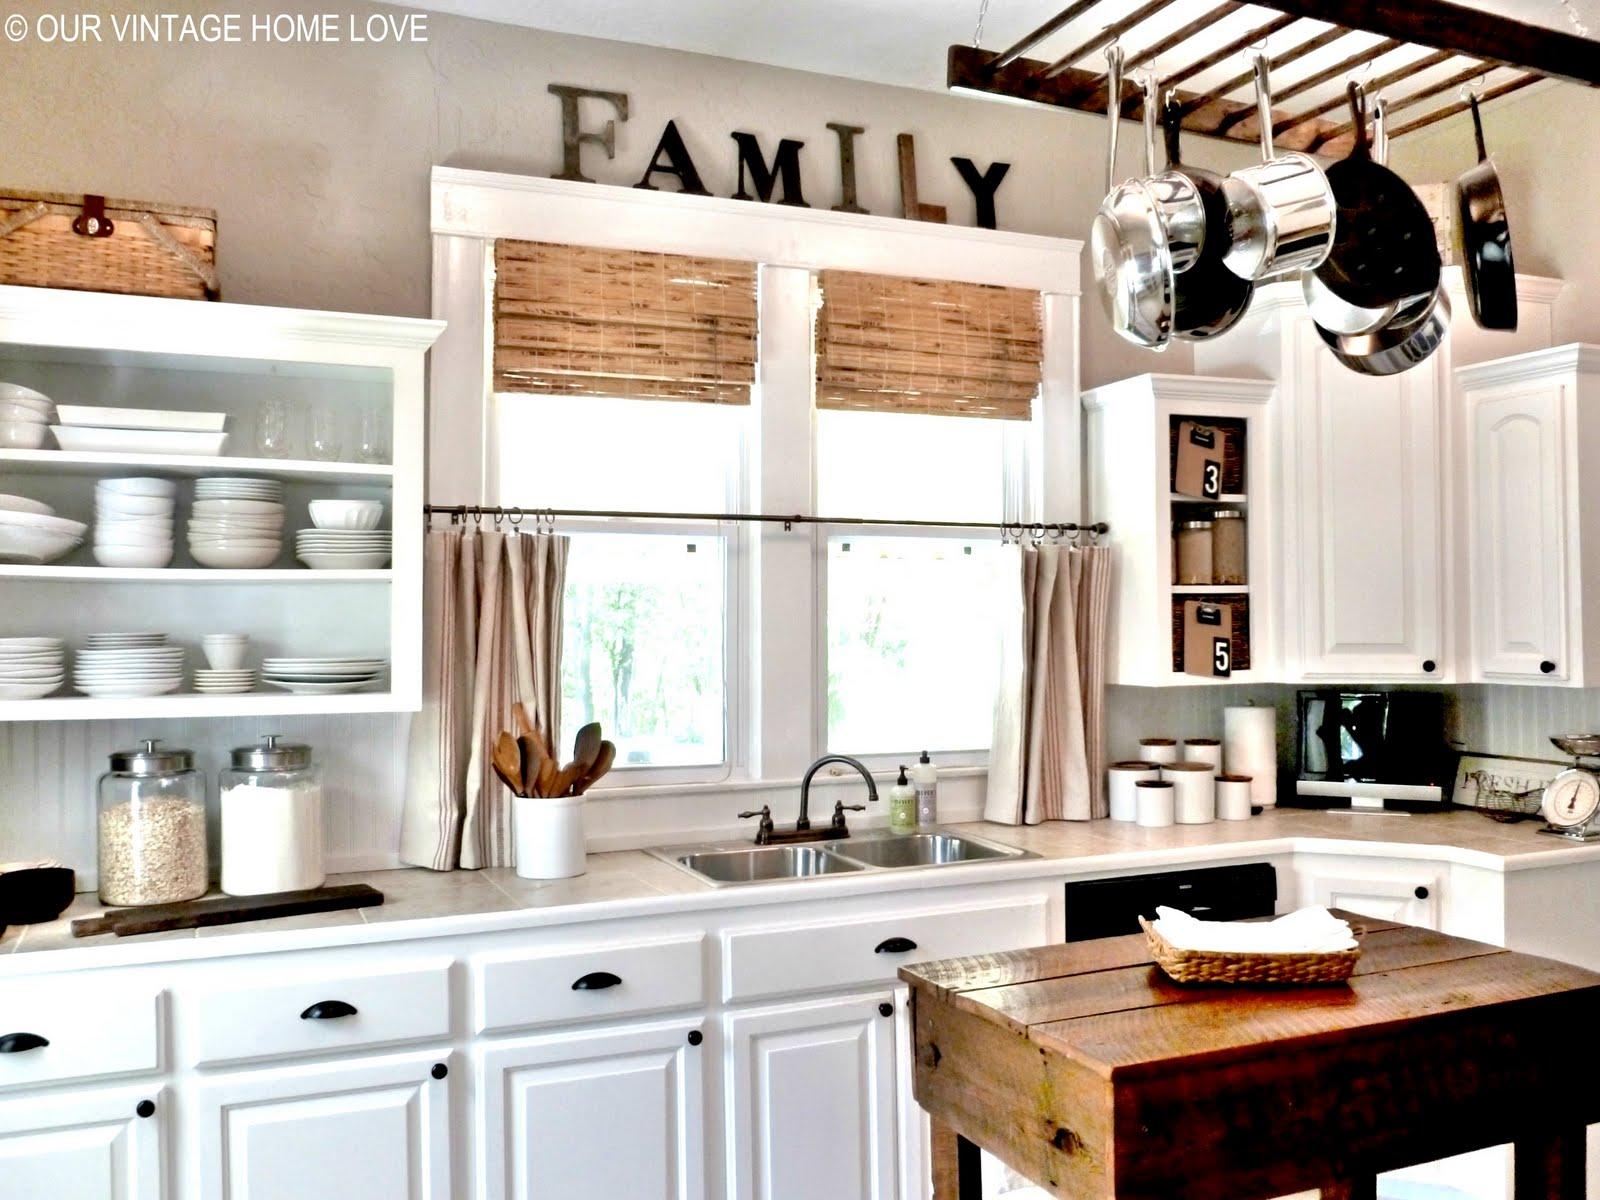 vintage home love: Kitchen Changes